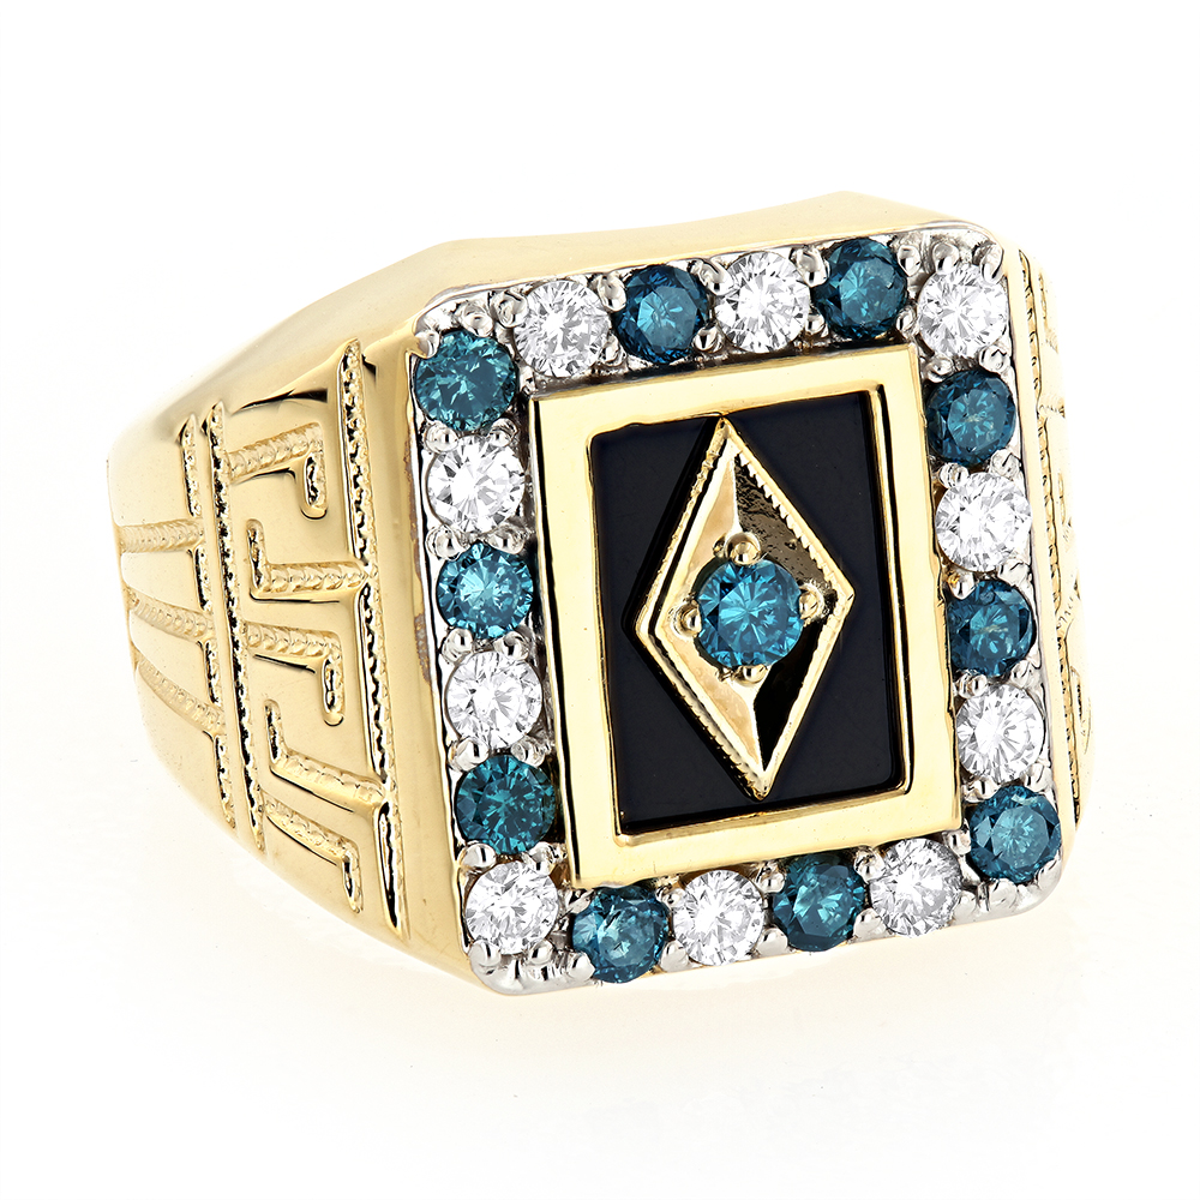 Black Onyx and Diamond Rings 14K Gold Mens White Blue Diamond Ring 1.68ct